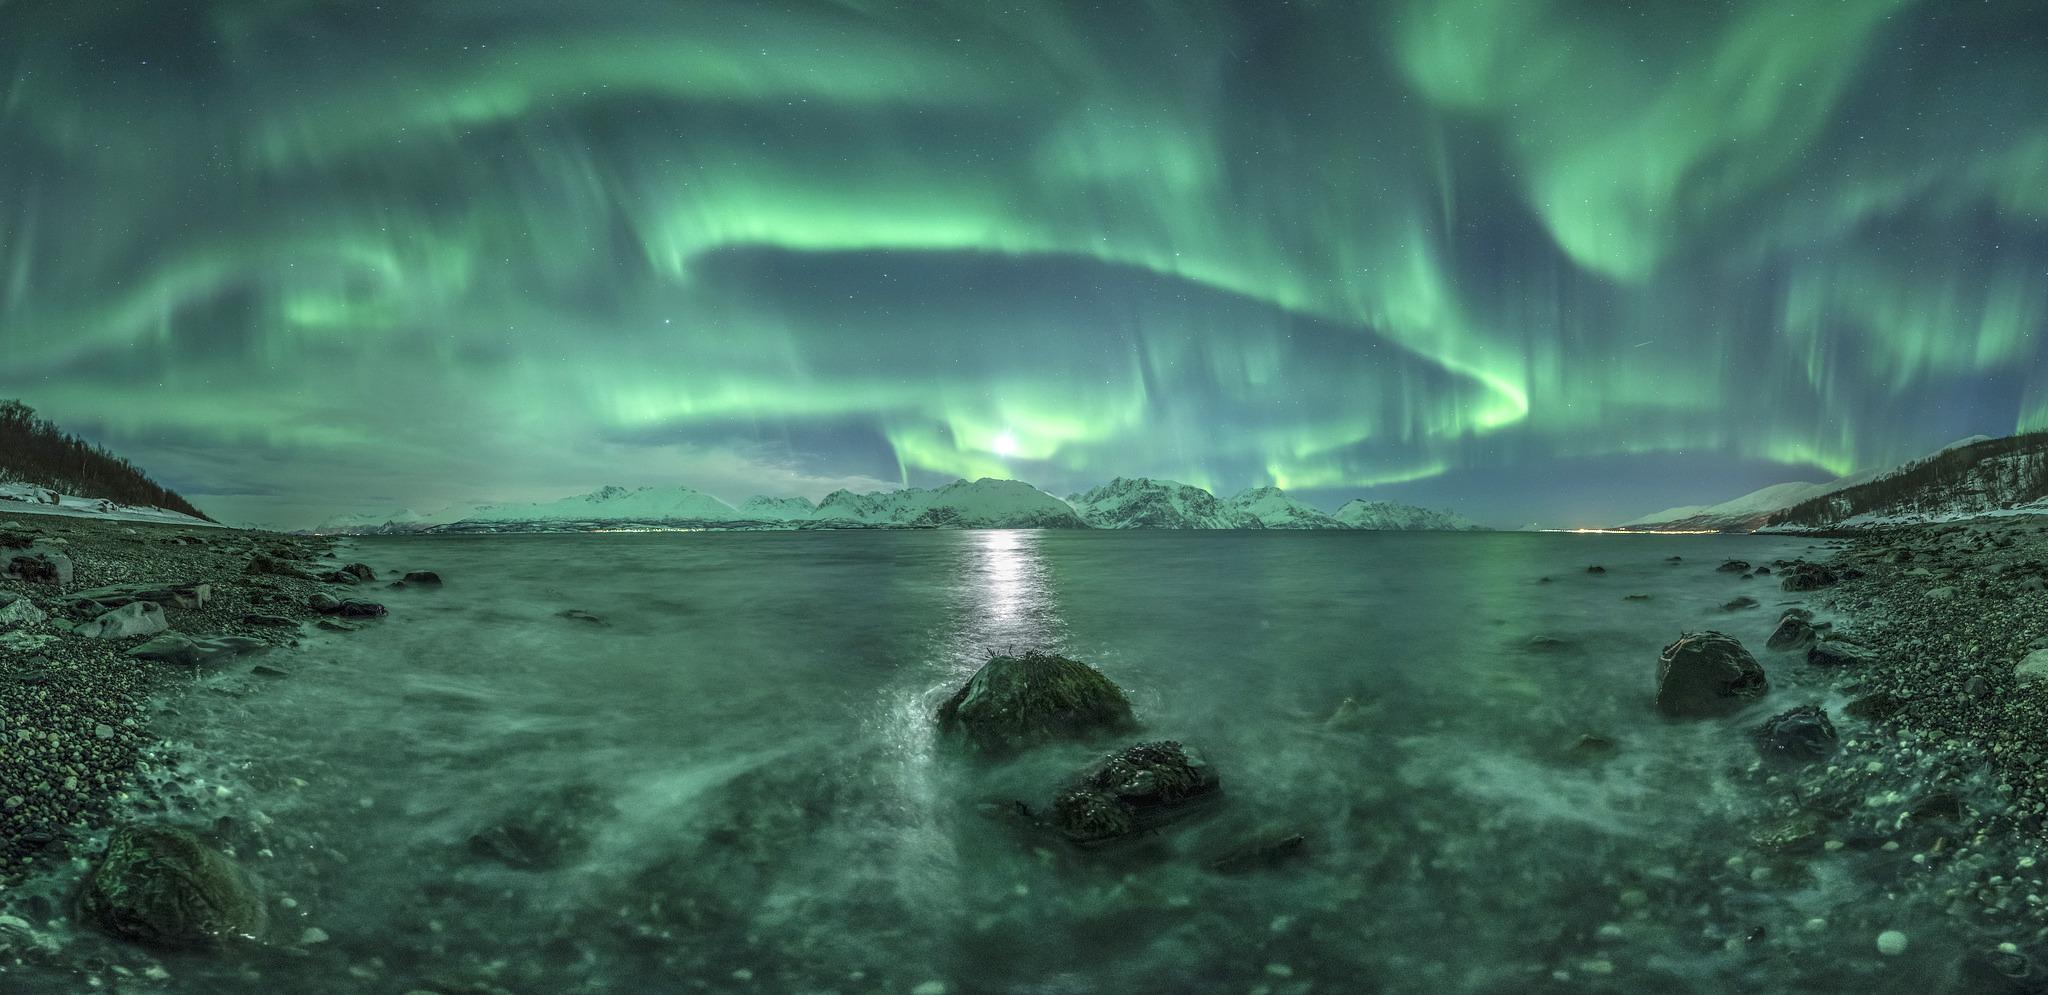 https://i.ibb.co/Y2bm9BG/Aurora-Panorama-3-JROlsen-2048x995.jpg